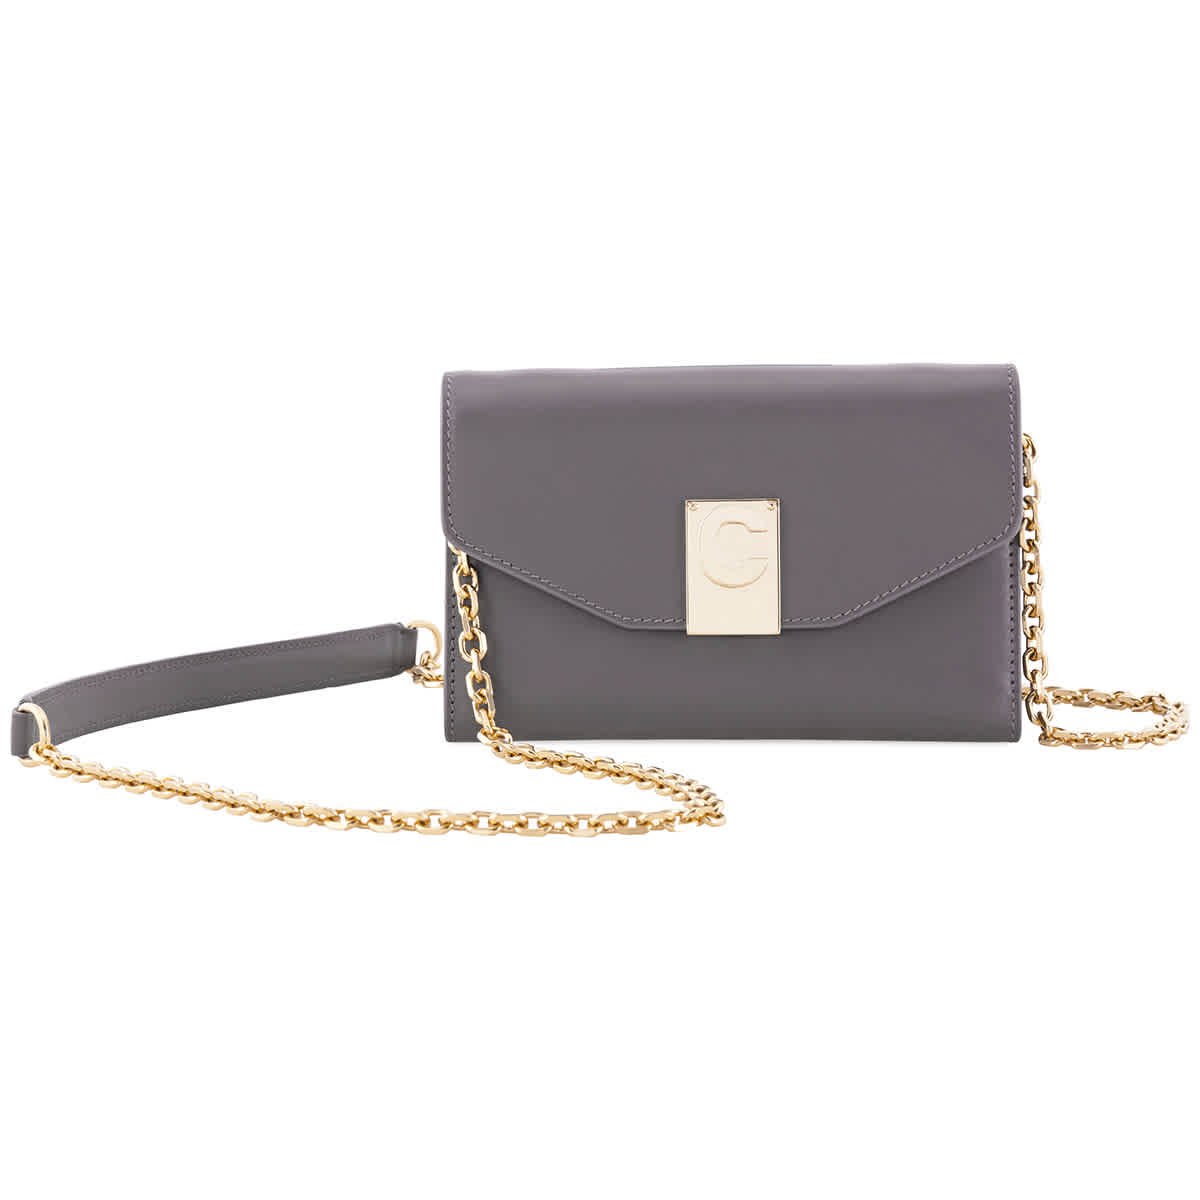 Celine Ladies Iphone X and XS Clutch Bag in Black - Celine